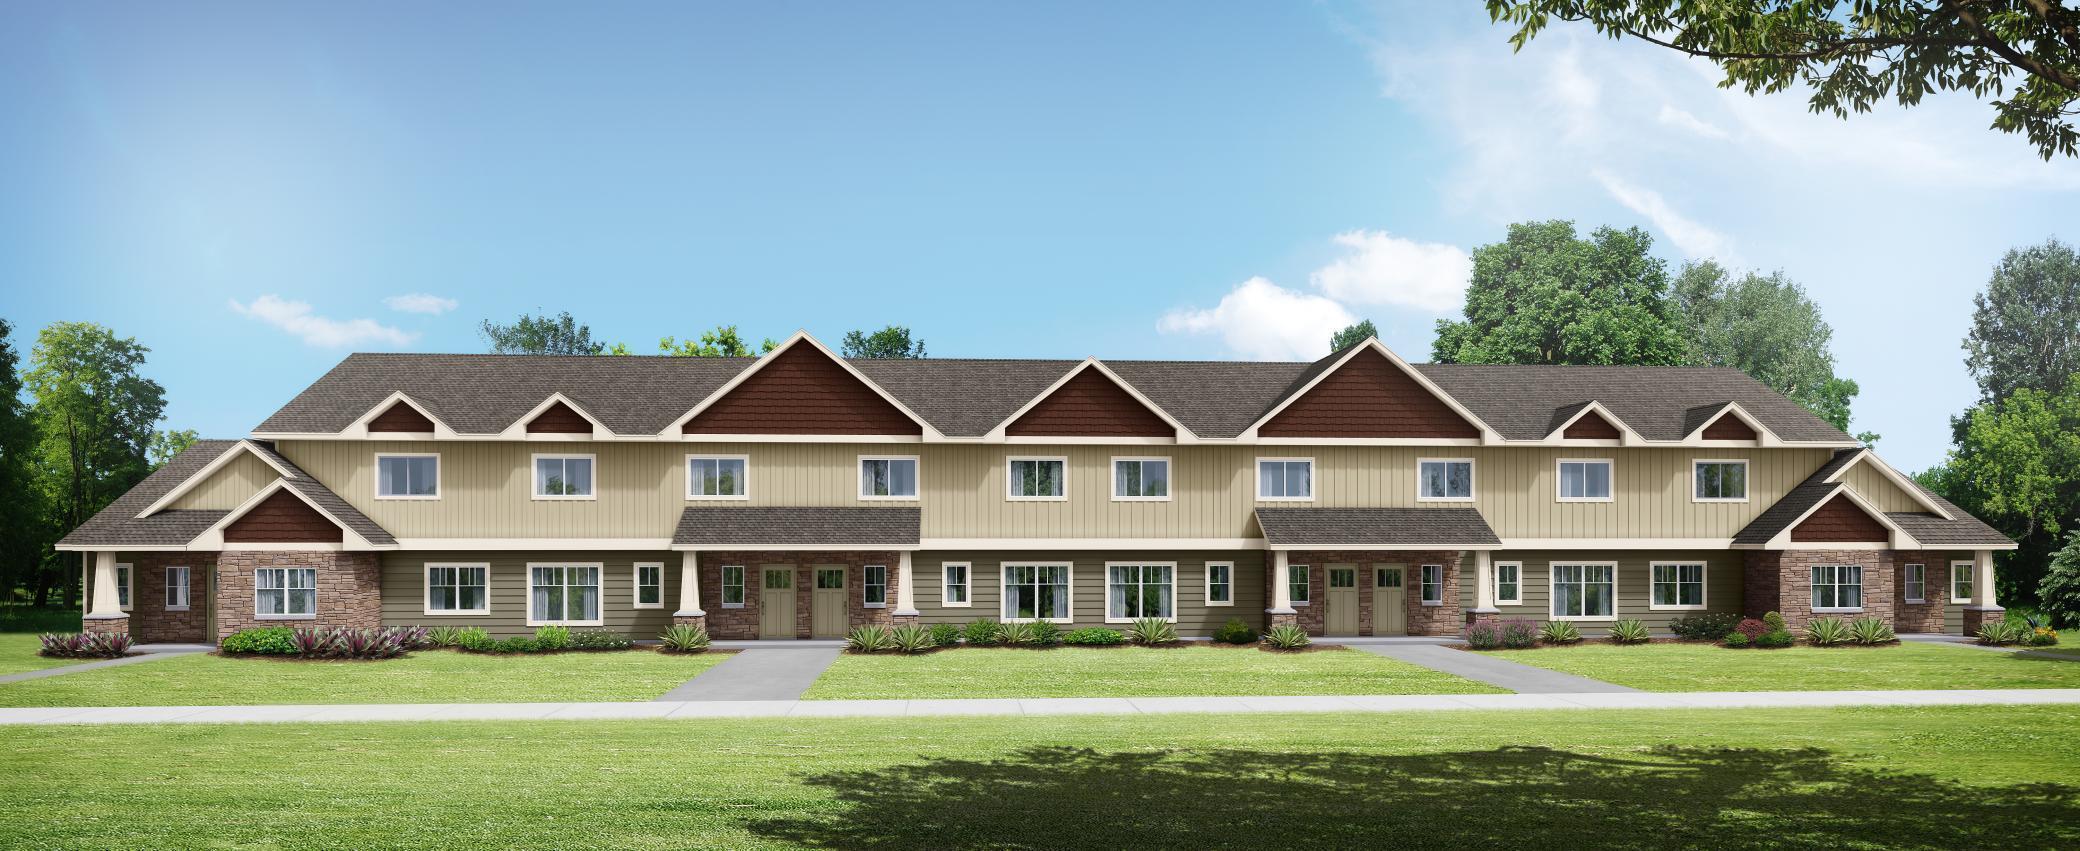 6960 Lancaster Way NE Property Photo - Albertville, MN real estate listing